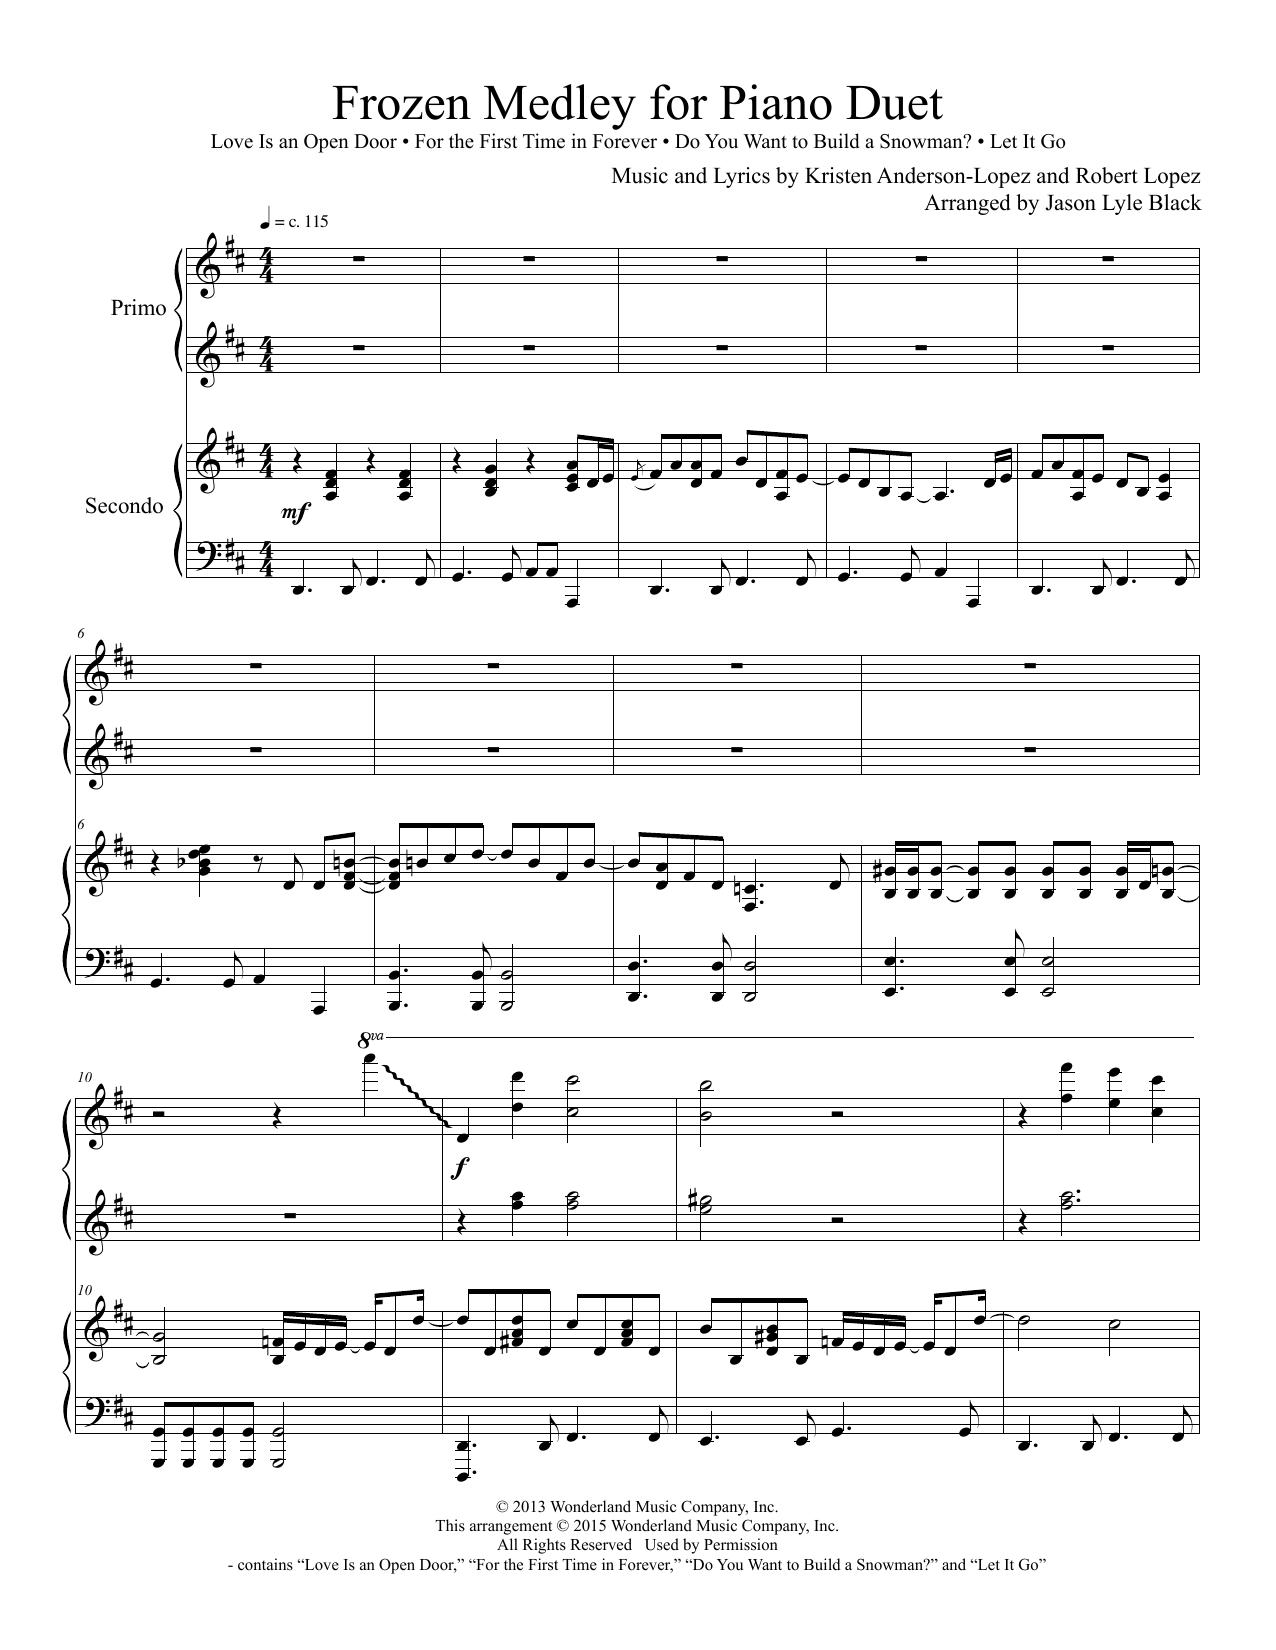 Jason Lyle Black Frozen Medley For Piano Duet Sheet Music Notes